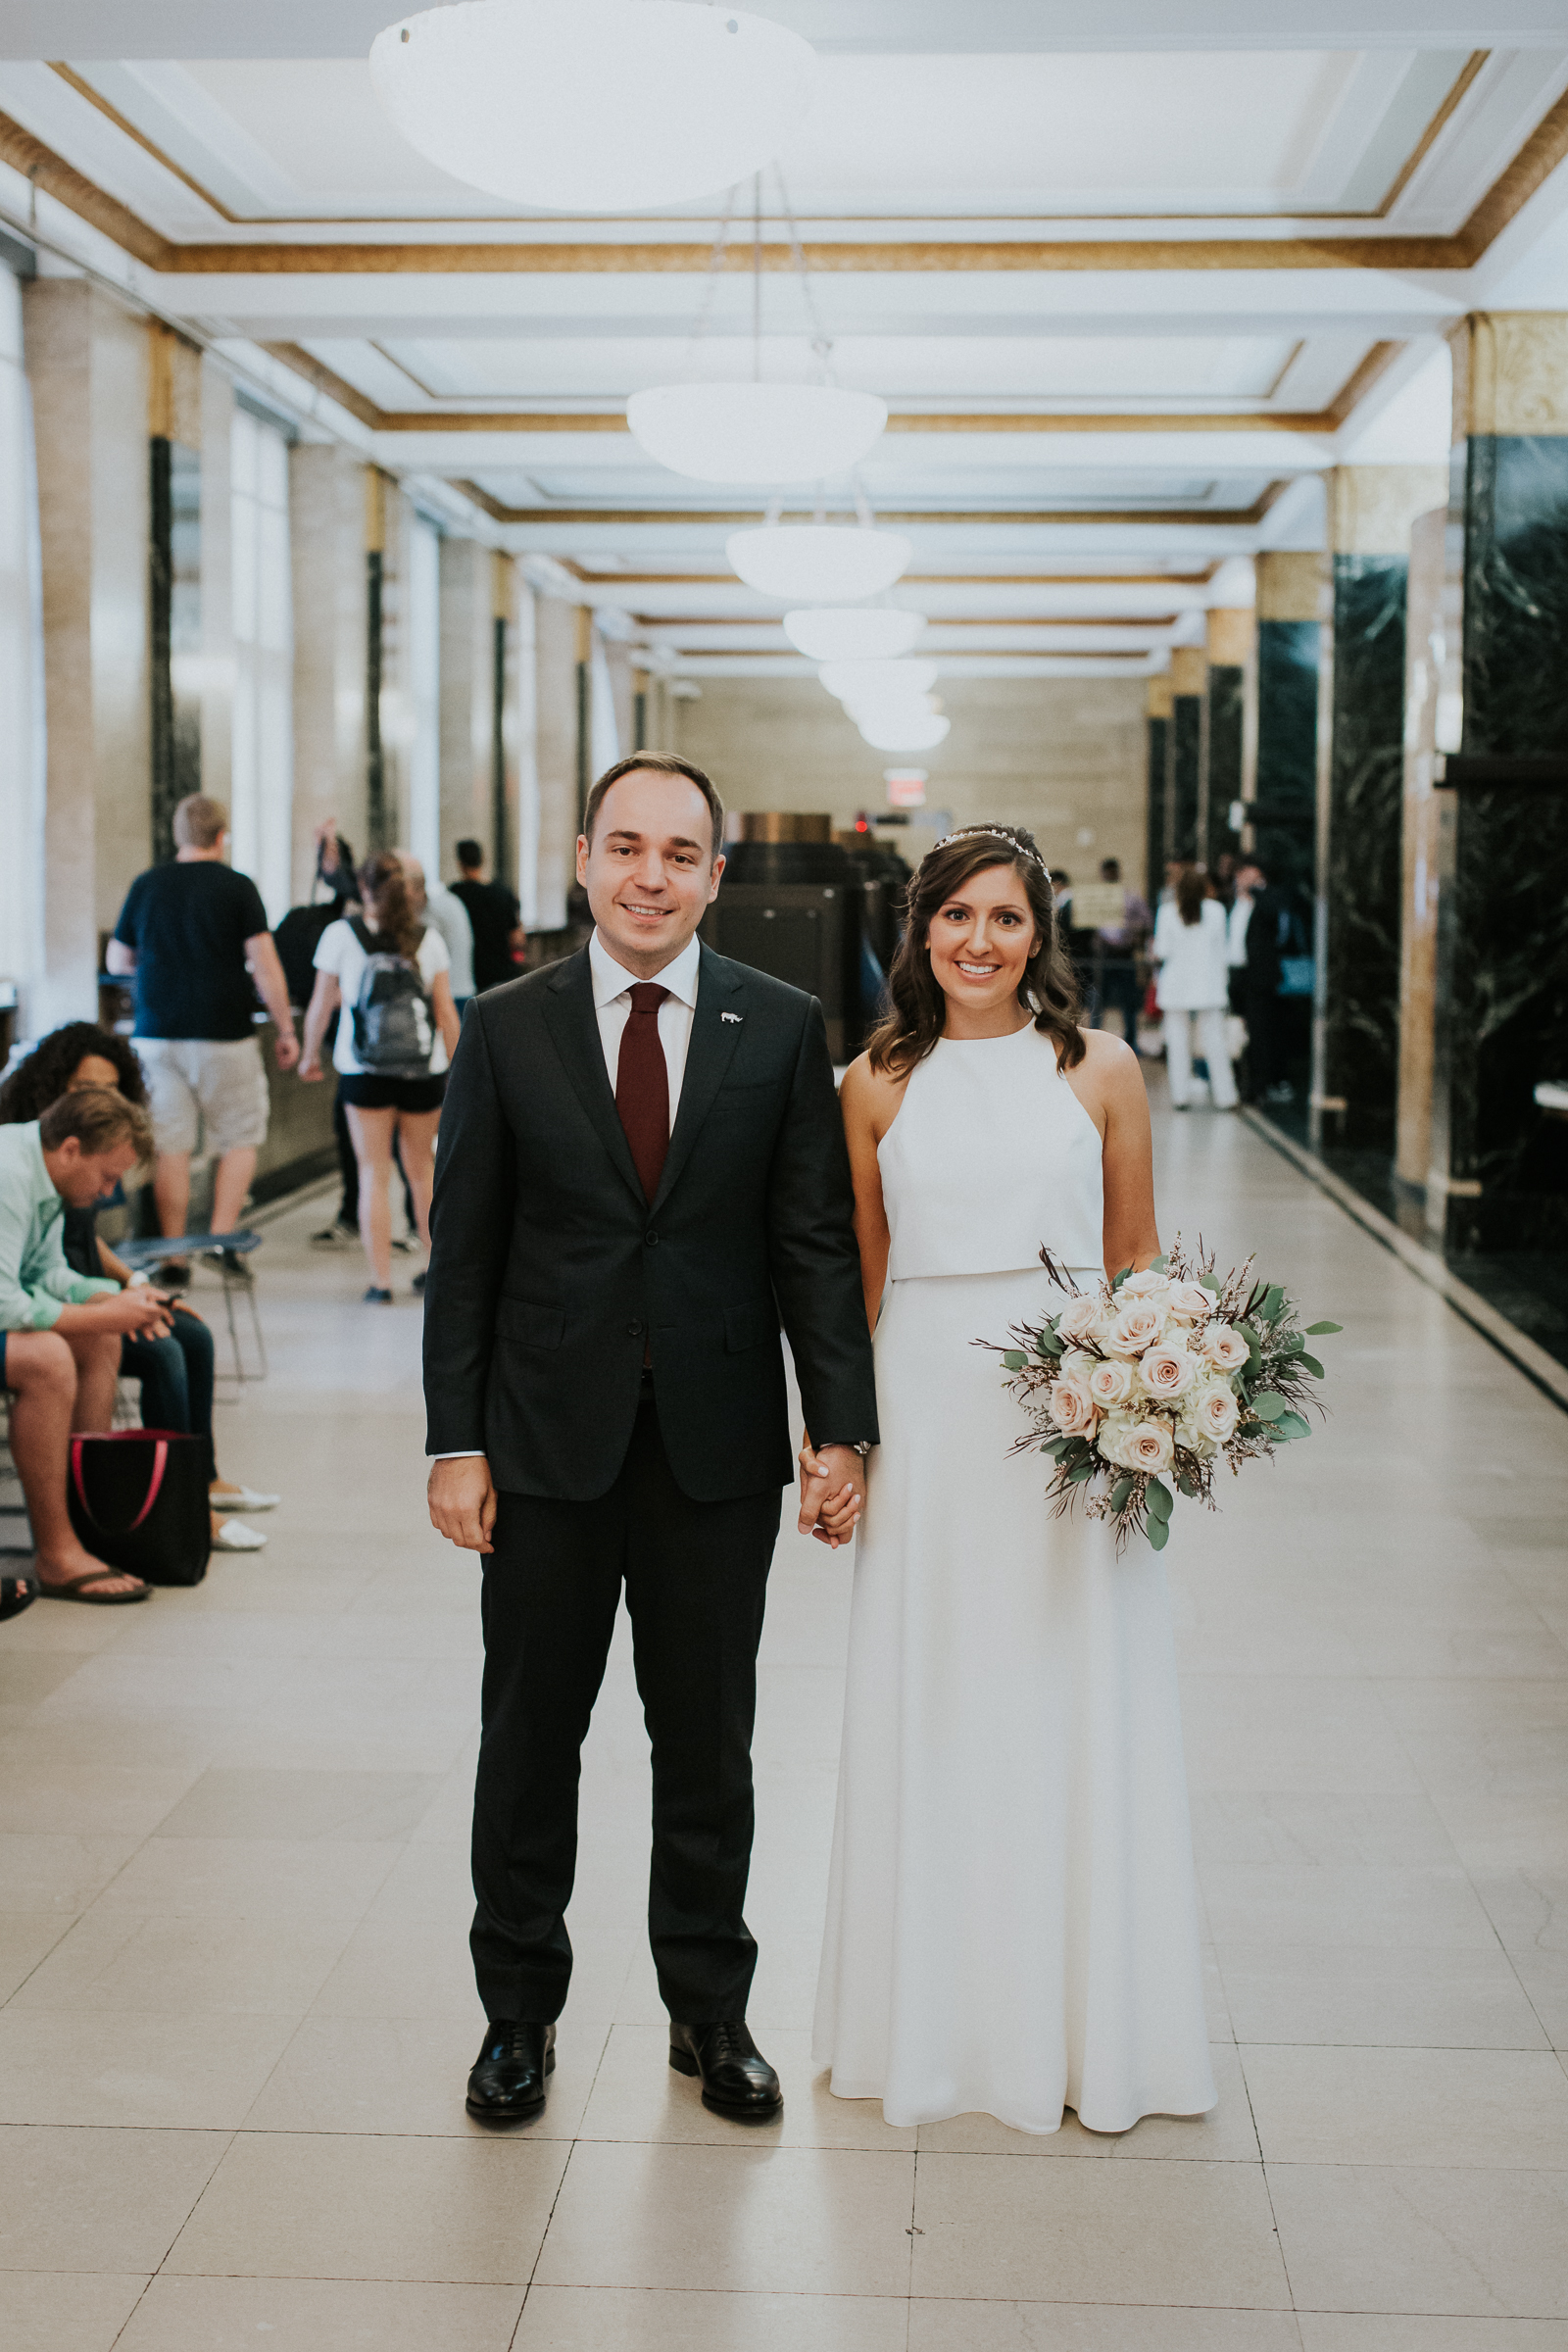 Casa-Apicii-Intimate-Wedding-City-Hall-Elopement-New-York-Documentary-Wedding-Photographer-3.jpg